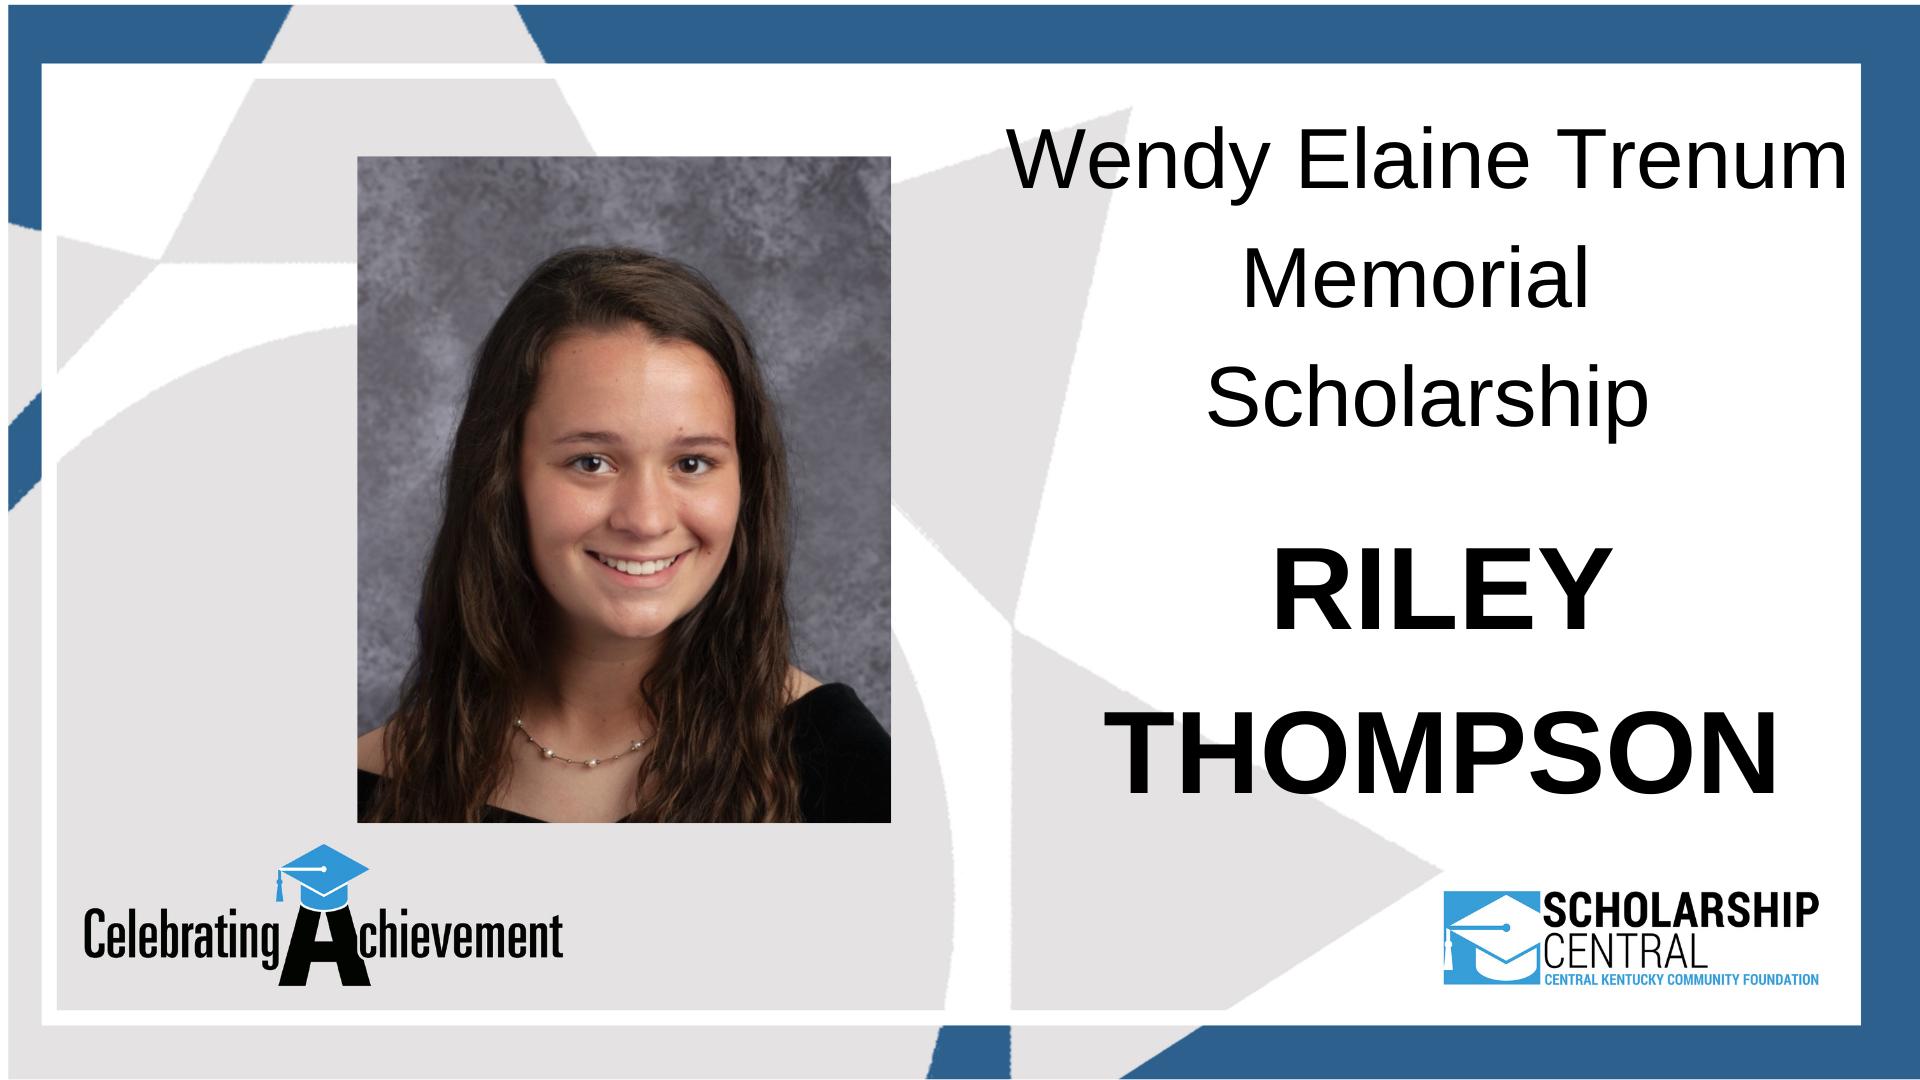 Wendy Elaine Trenum Memorial Scholarship Winner